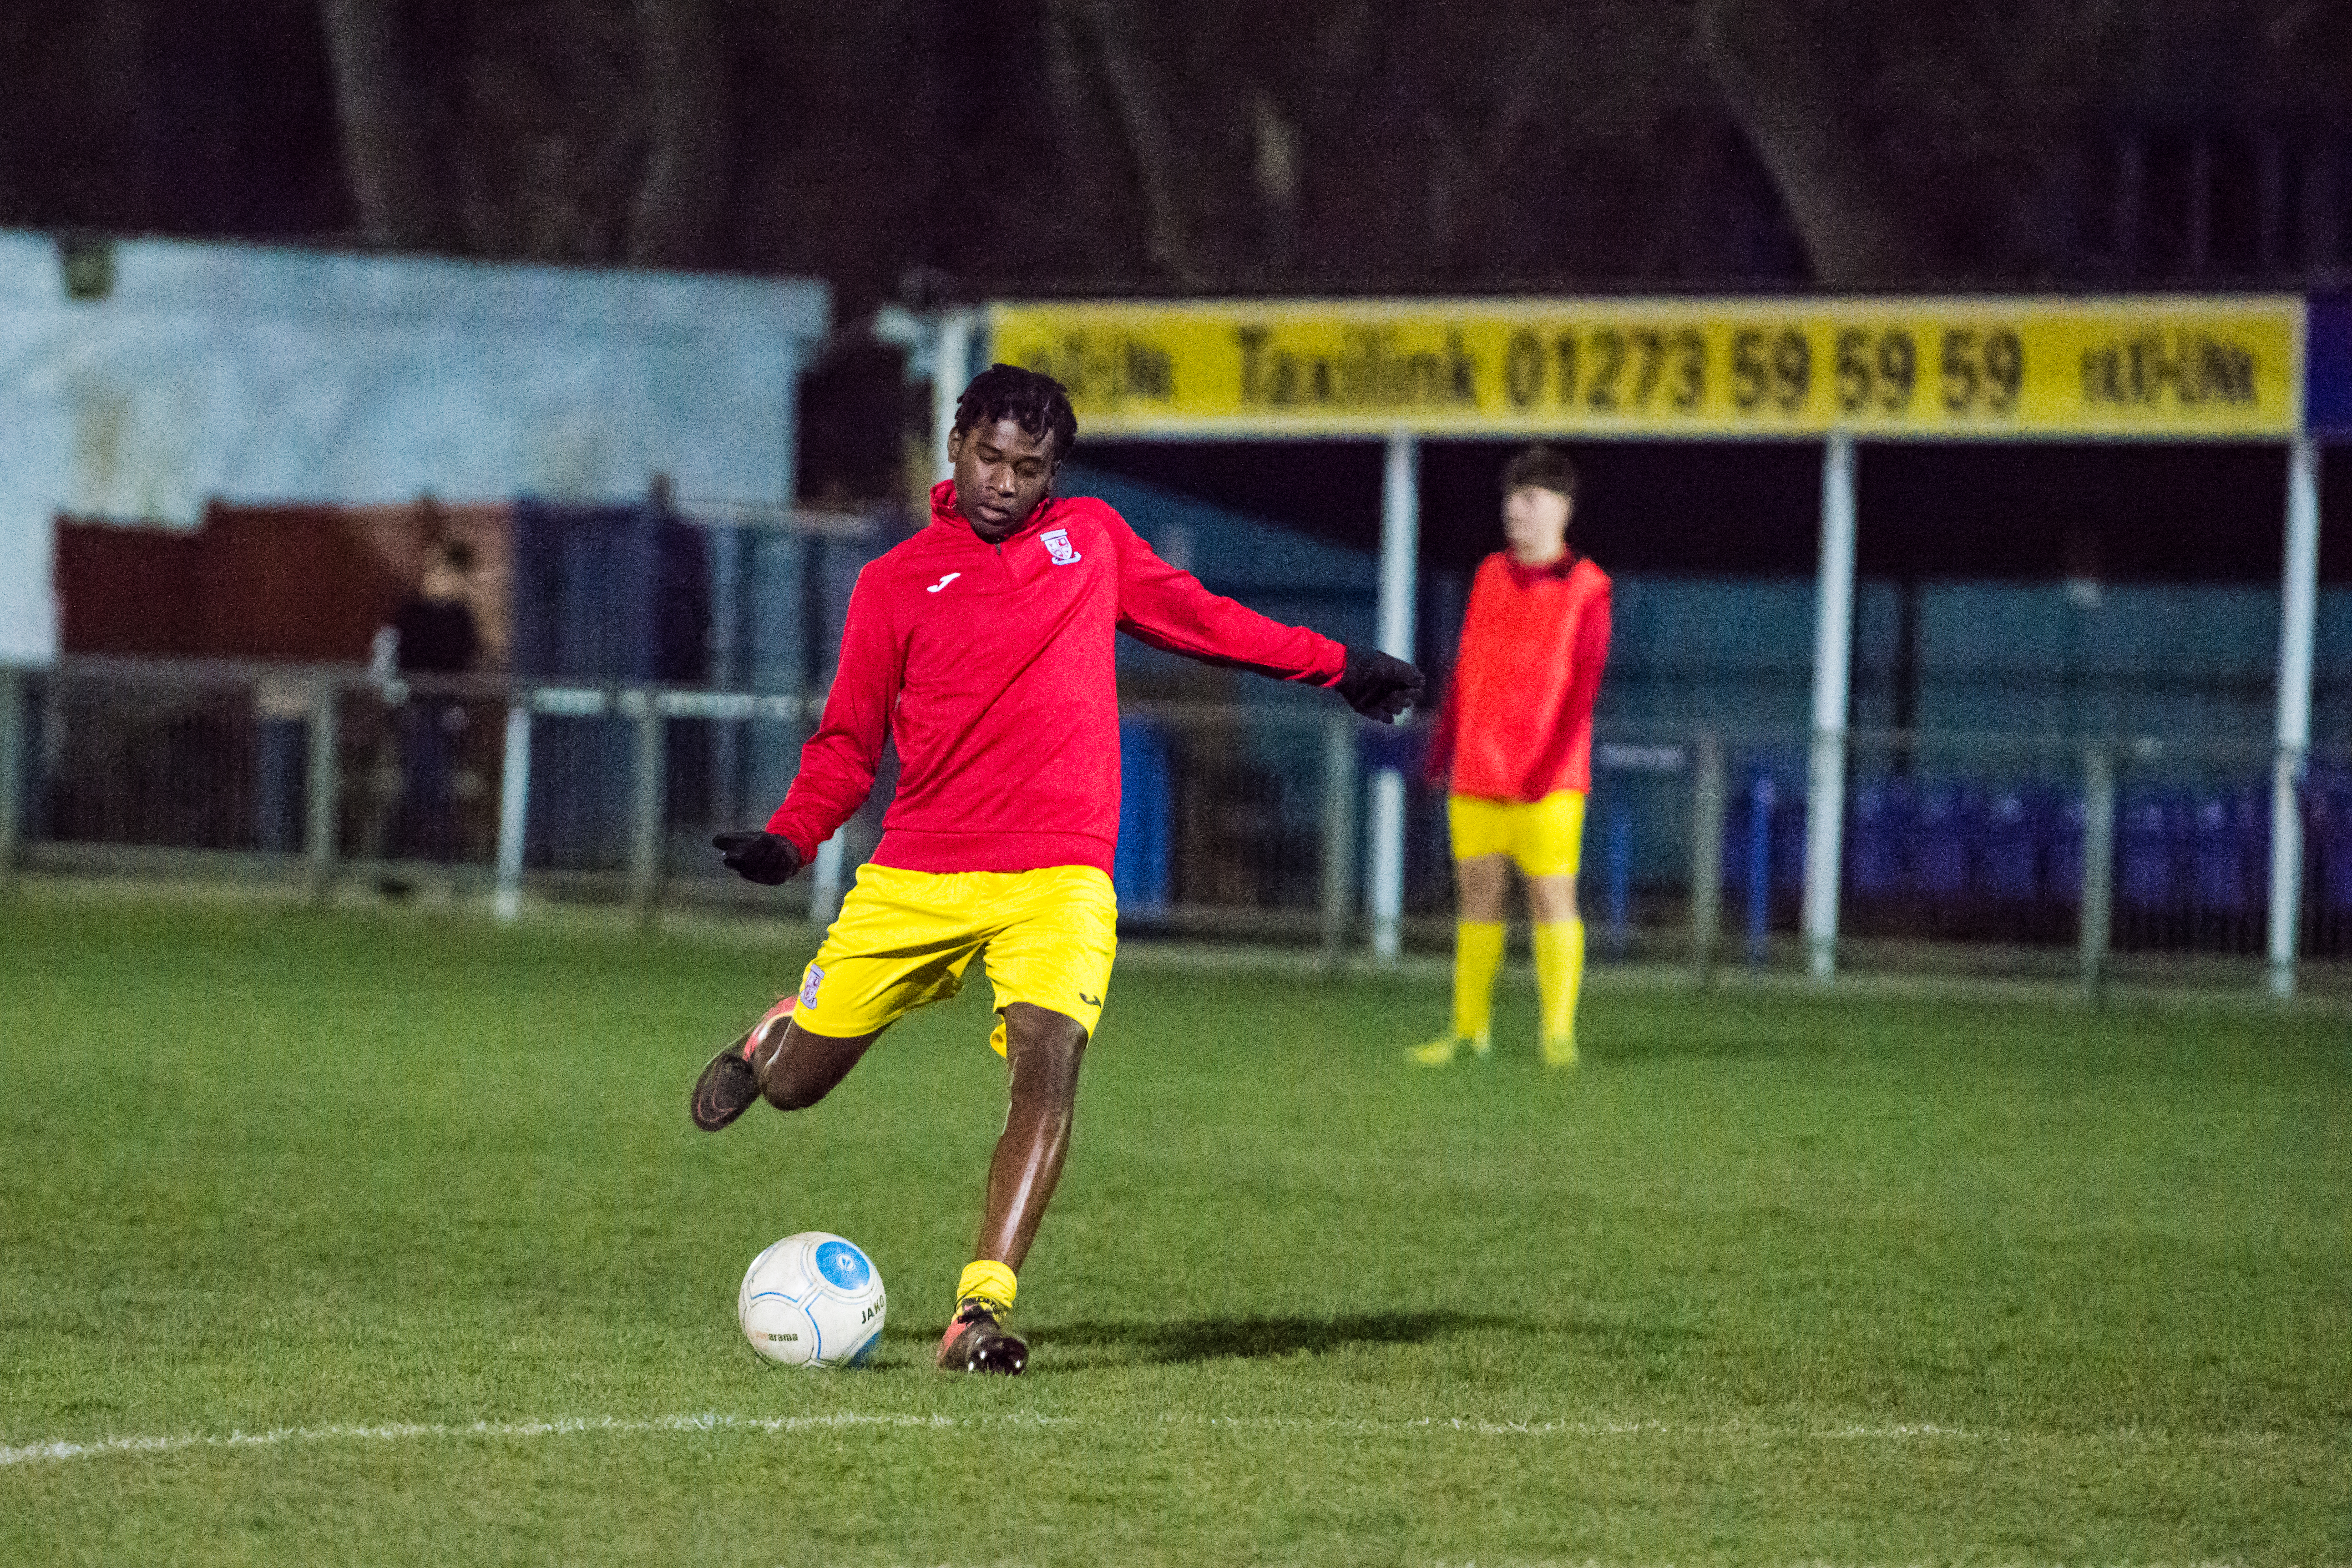 DAVID_JEFFERY Shoreham FC U18s vs Woking FC Academy 22.03.18 09